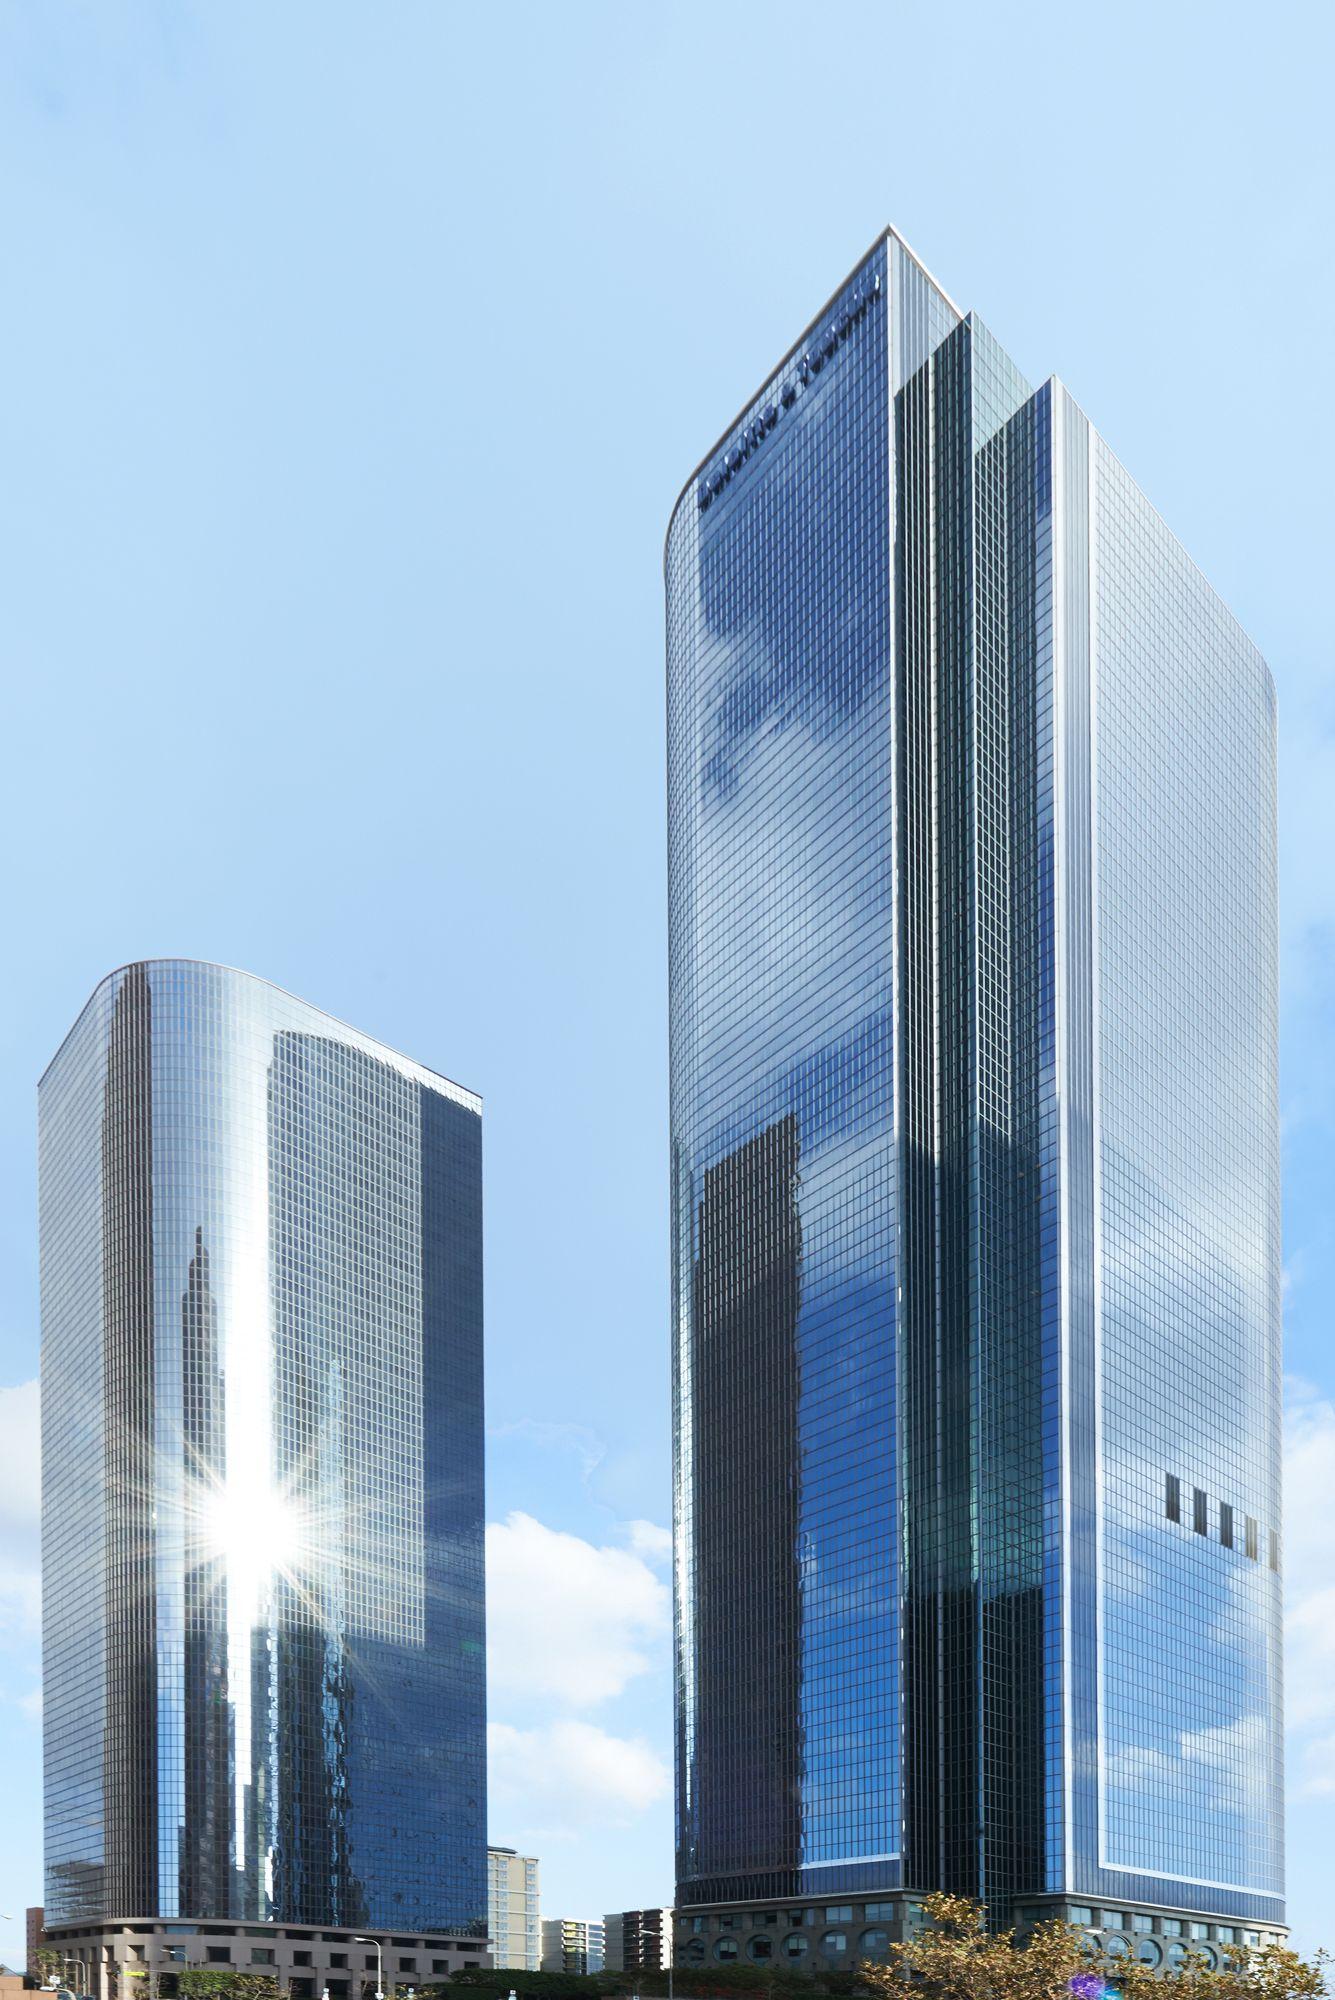 Commercial Architectural Photography Portfolio of Architectural Photographer Peter Christiansen Valli - Two California Plaza